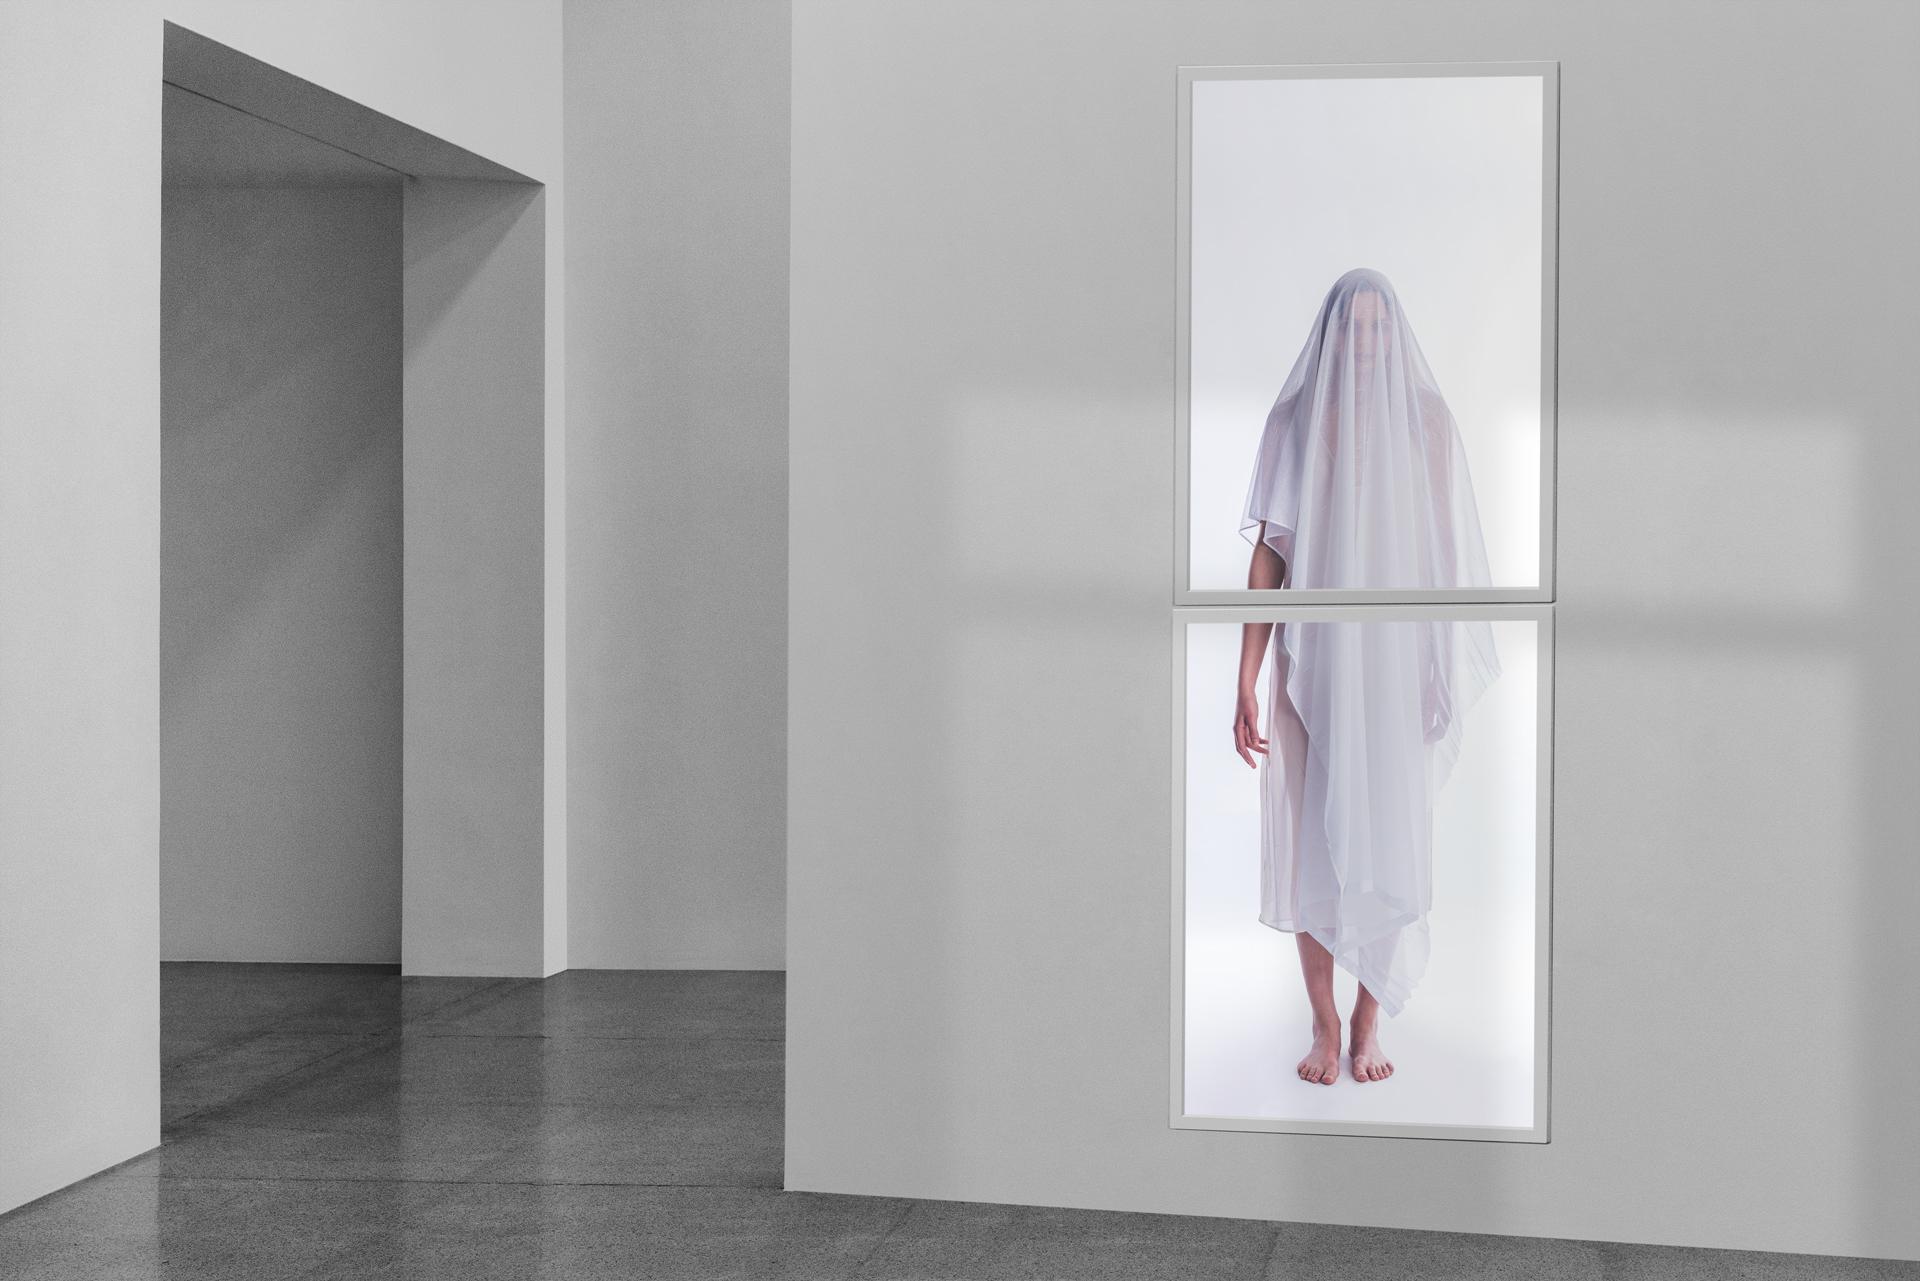 Apparition, installation view.